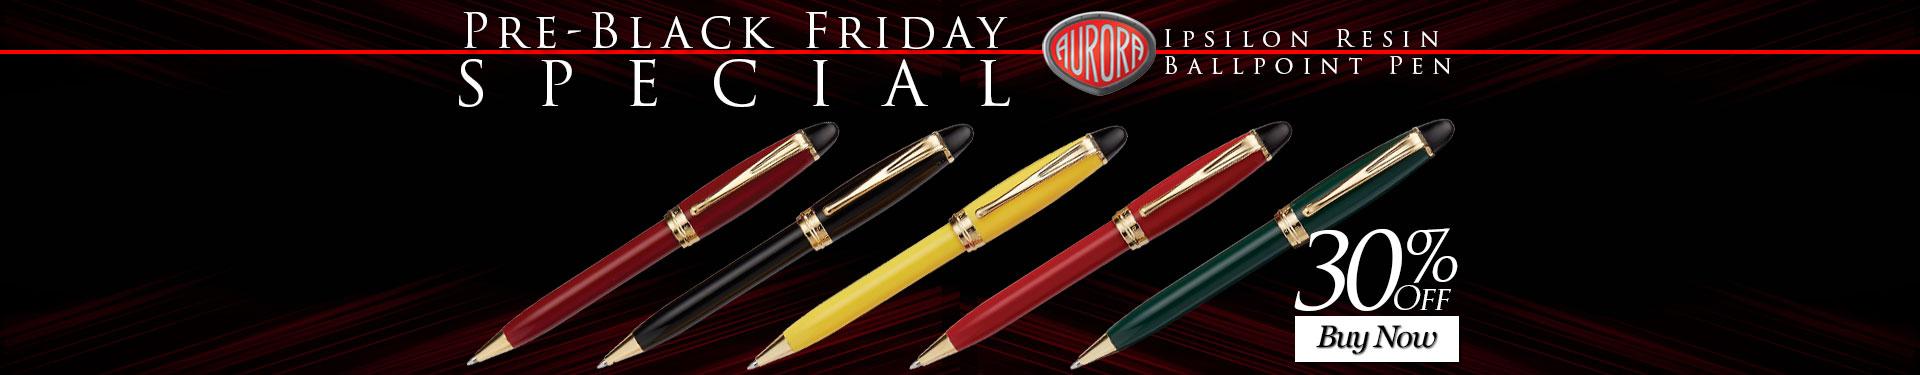 Pre-Black Friday Special - 30% Off Aurora Ipsilon Resin Ballpoint Pen